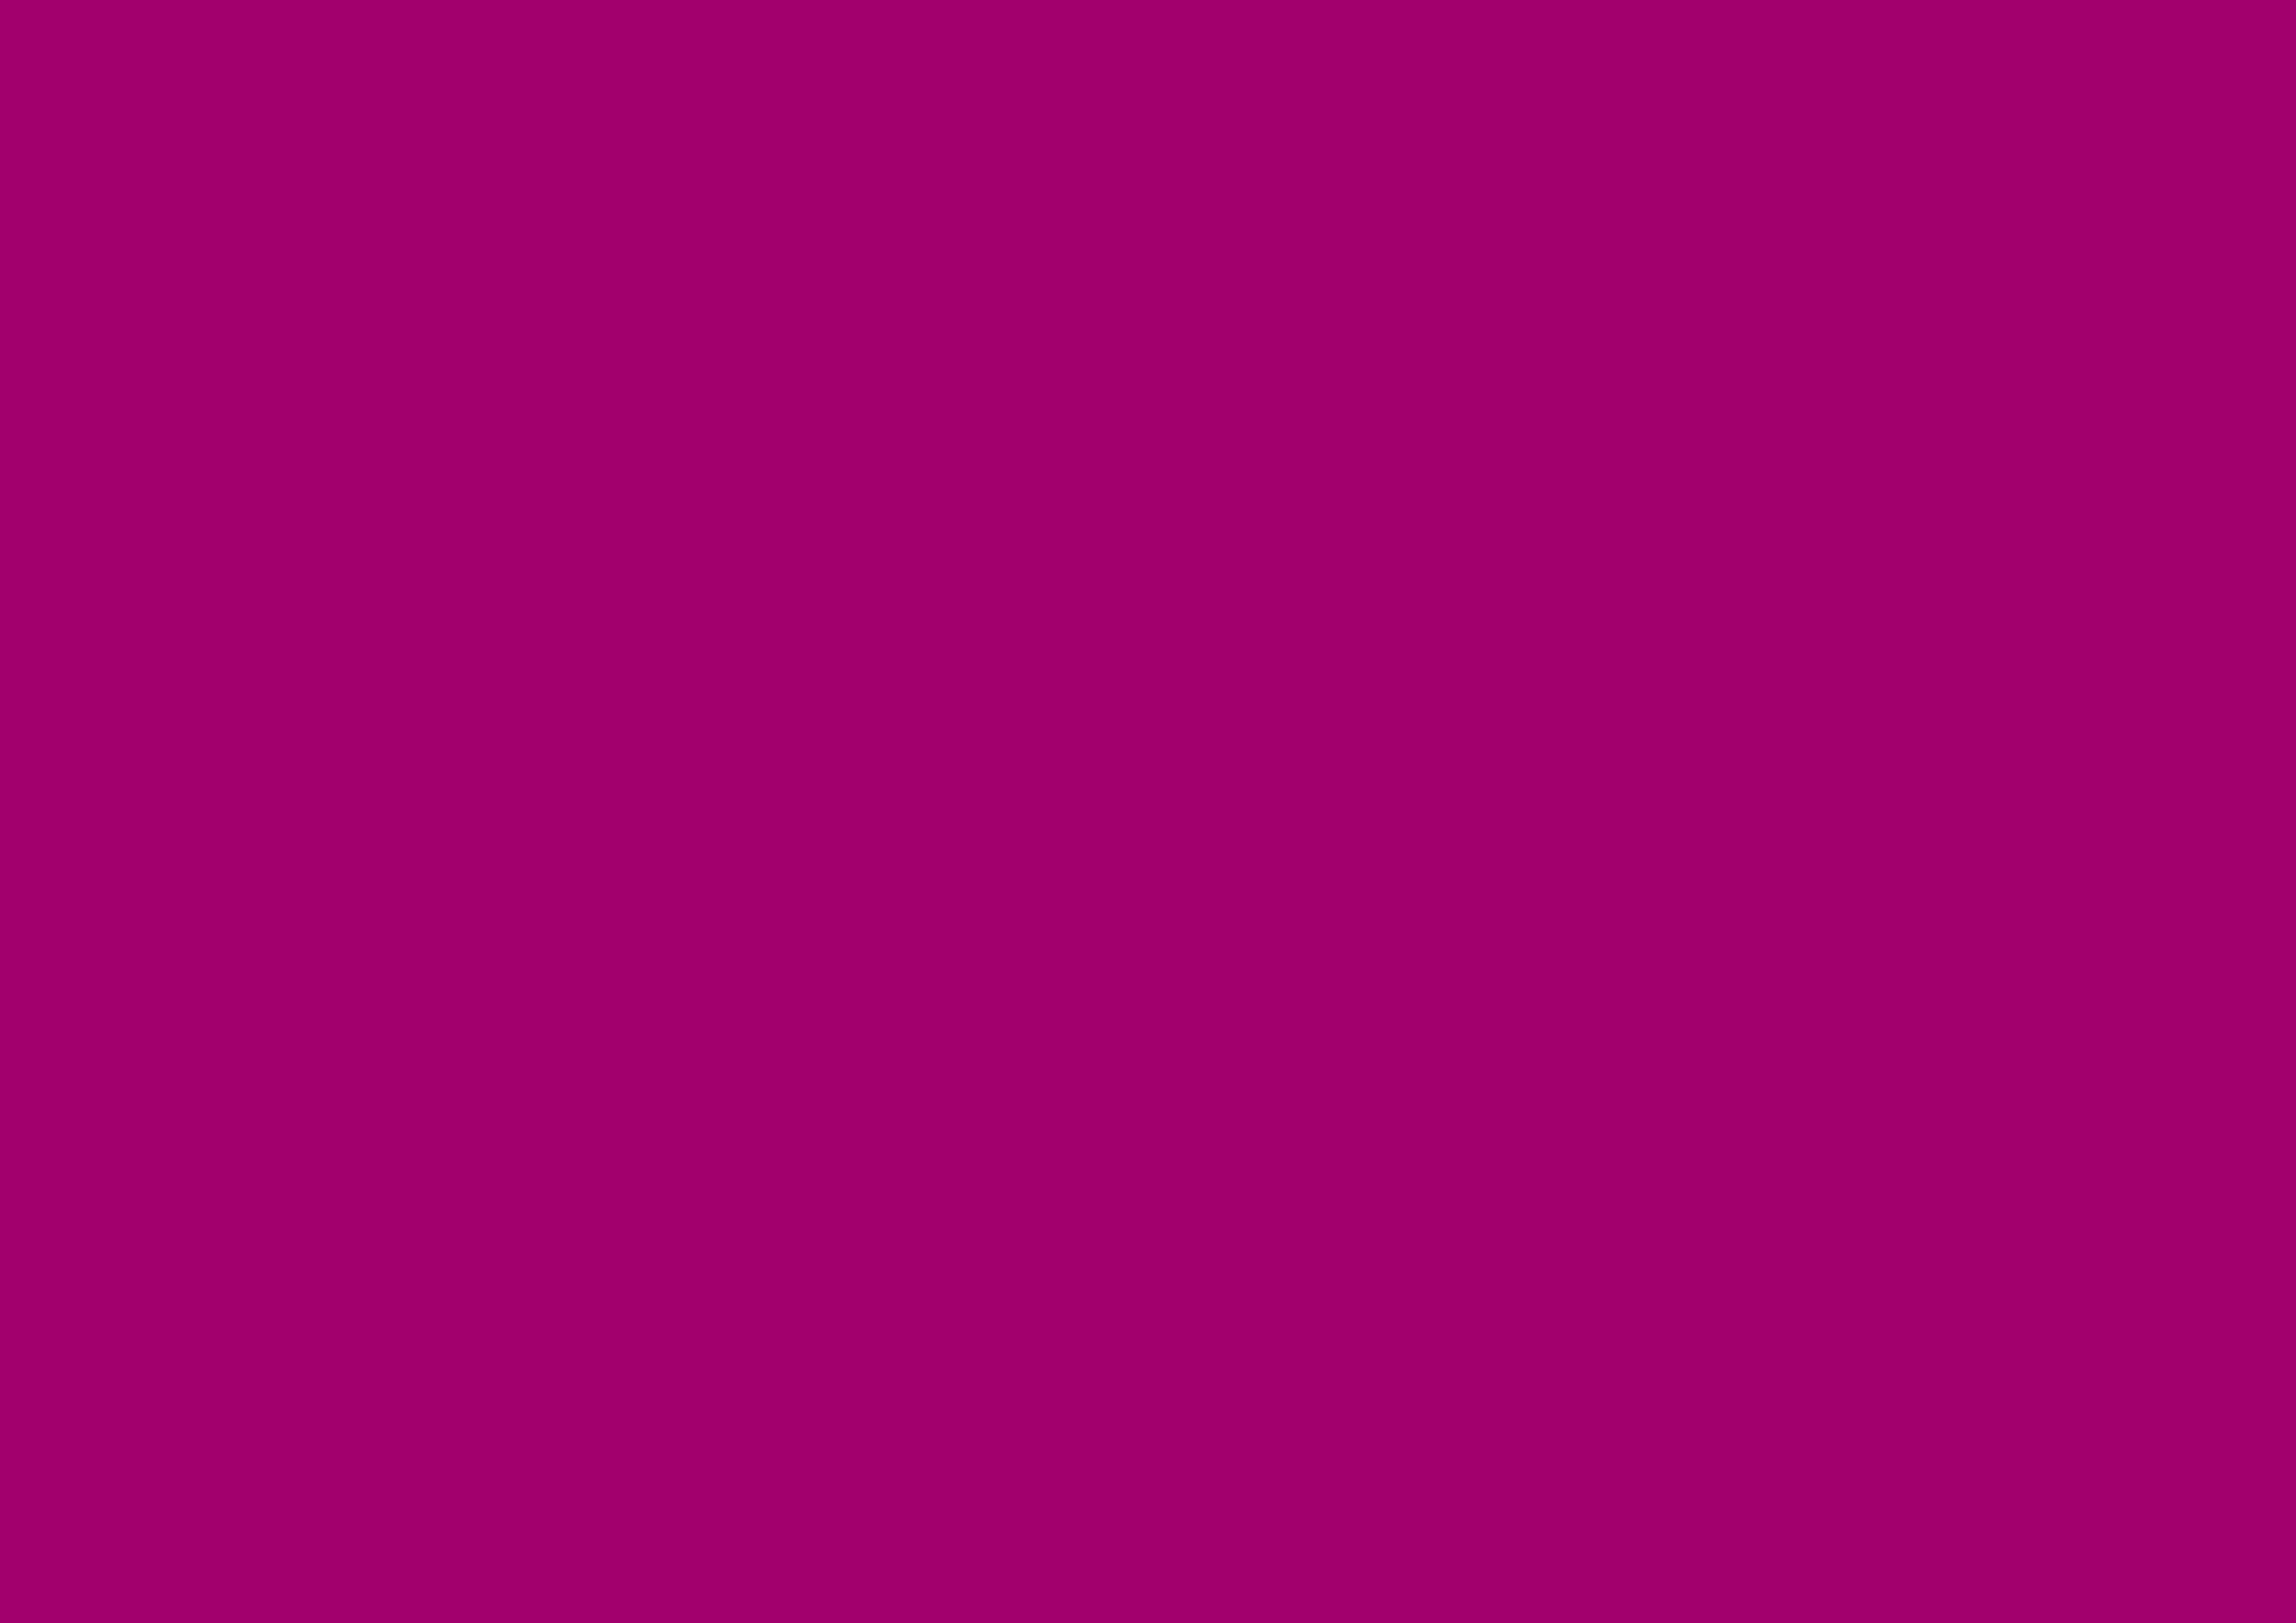 3508x2480 Flirt Solid Color Background